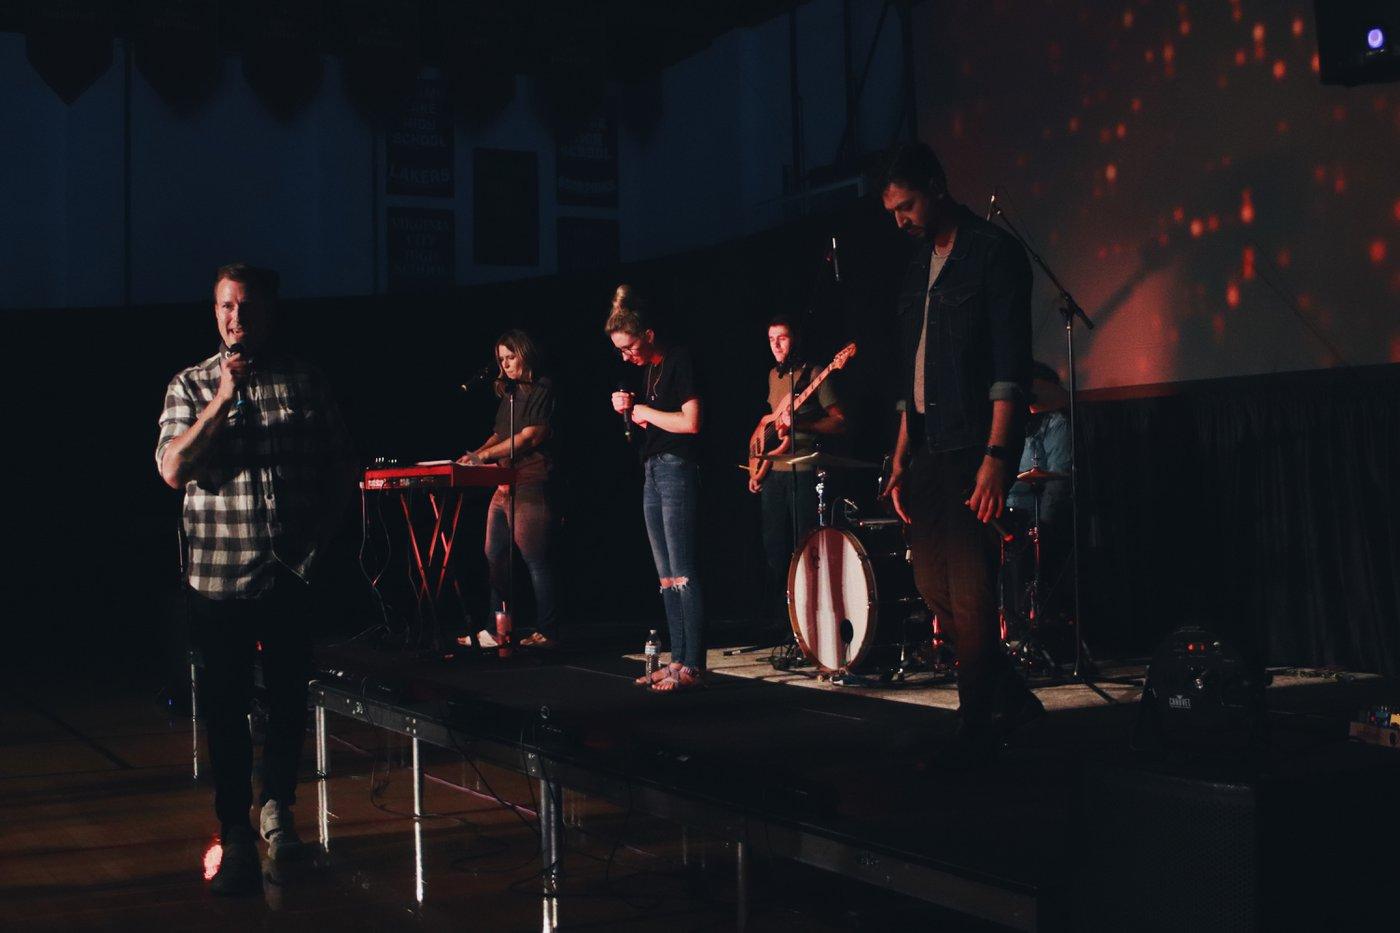 Jesus followers in worship